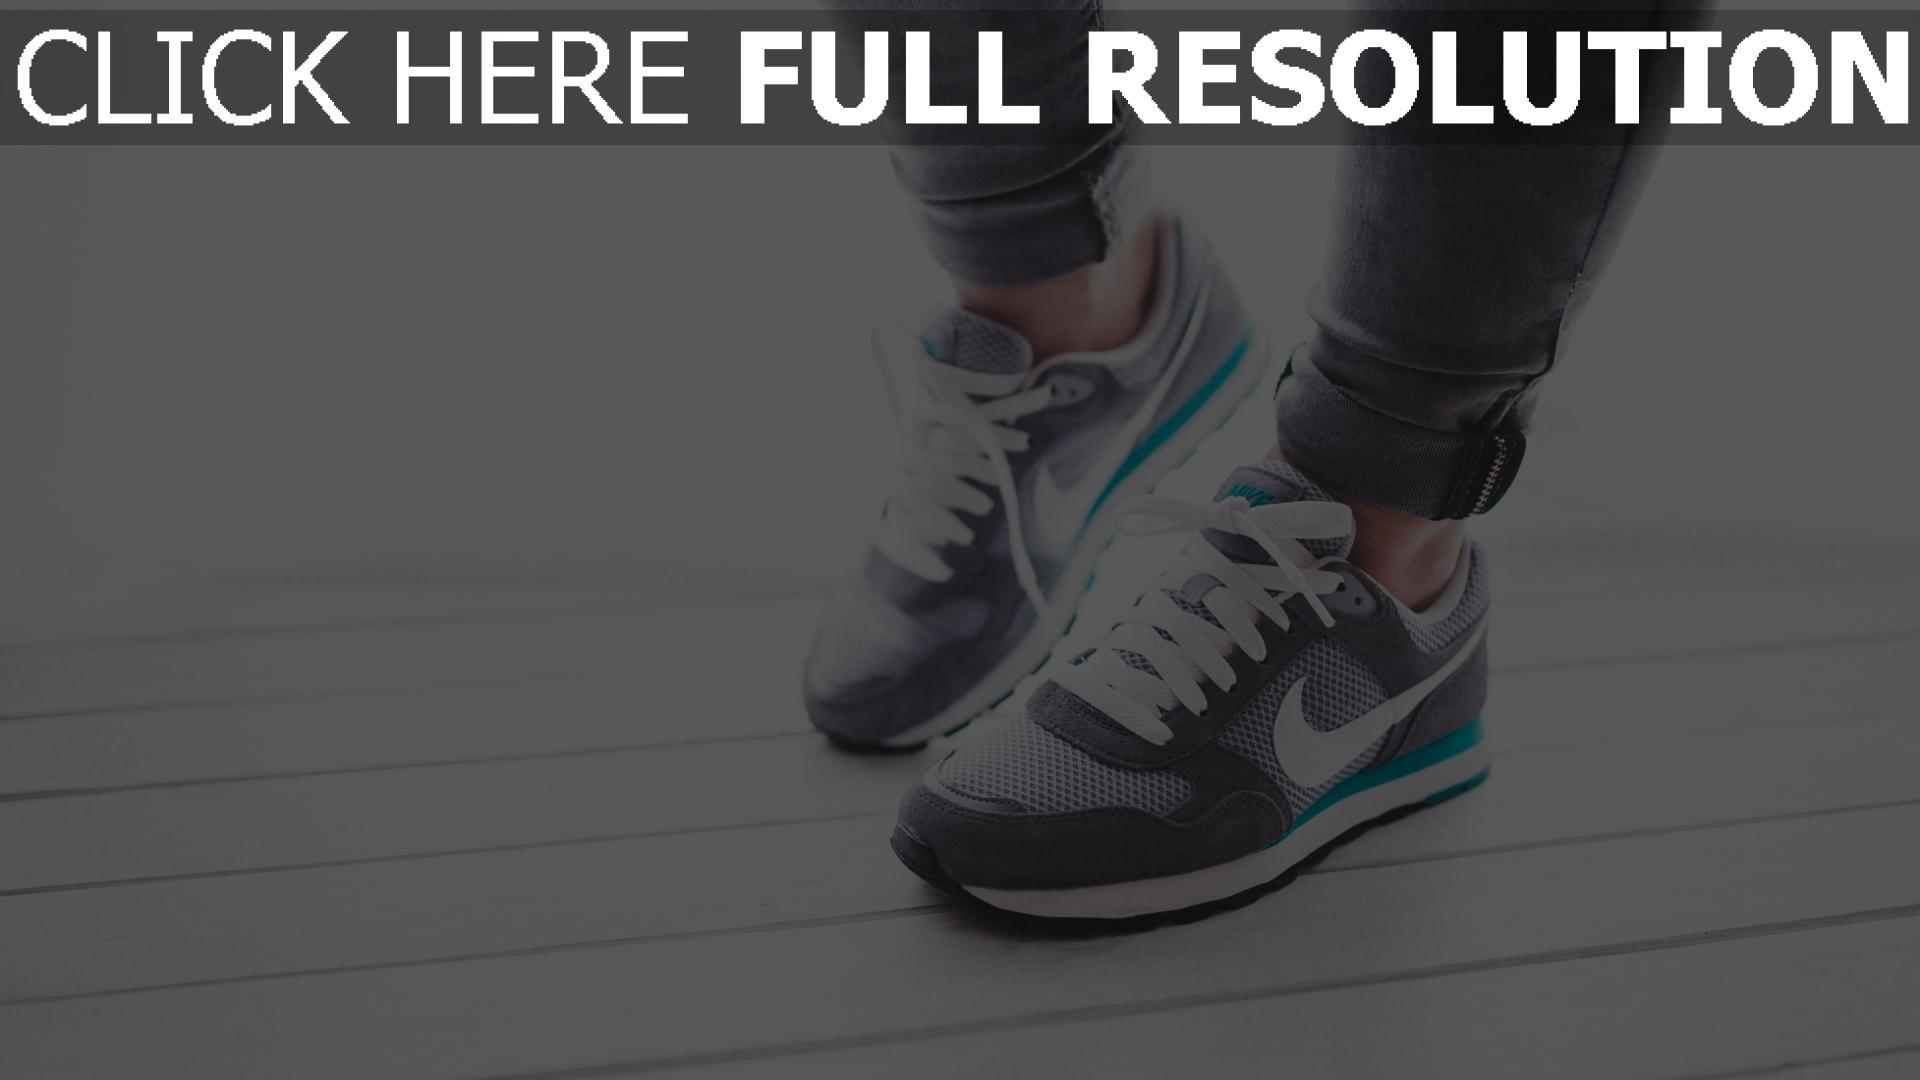 Hd Füße Schuhe Turnschuhedesktop Nike Hintergrundbilder Rj3S5LqAc4